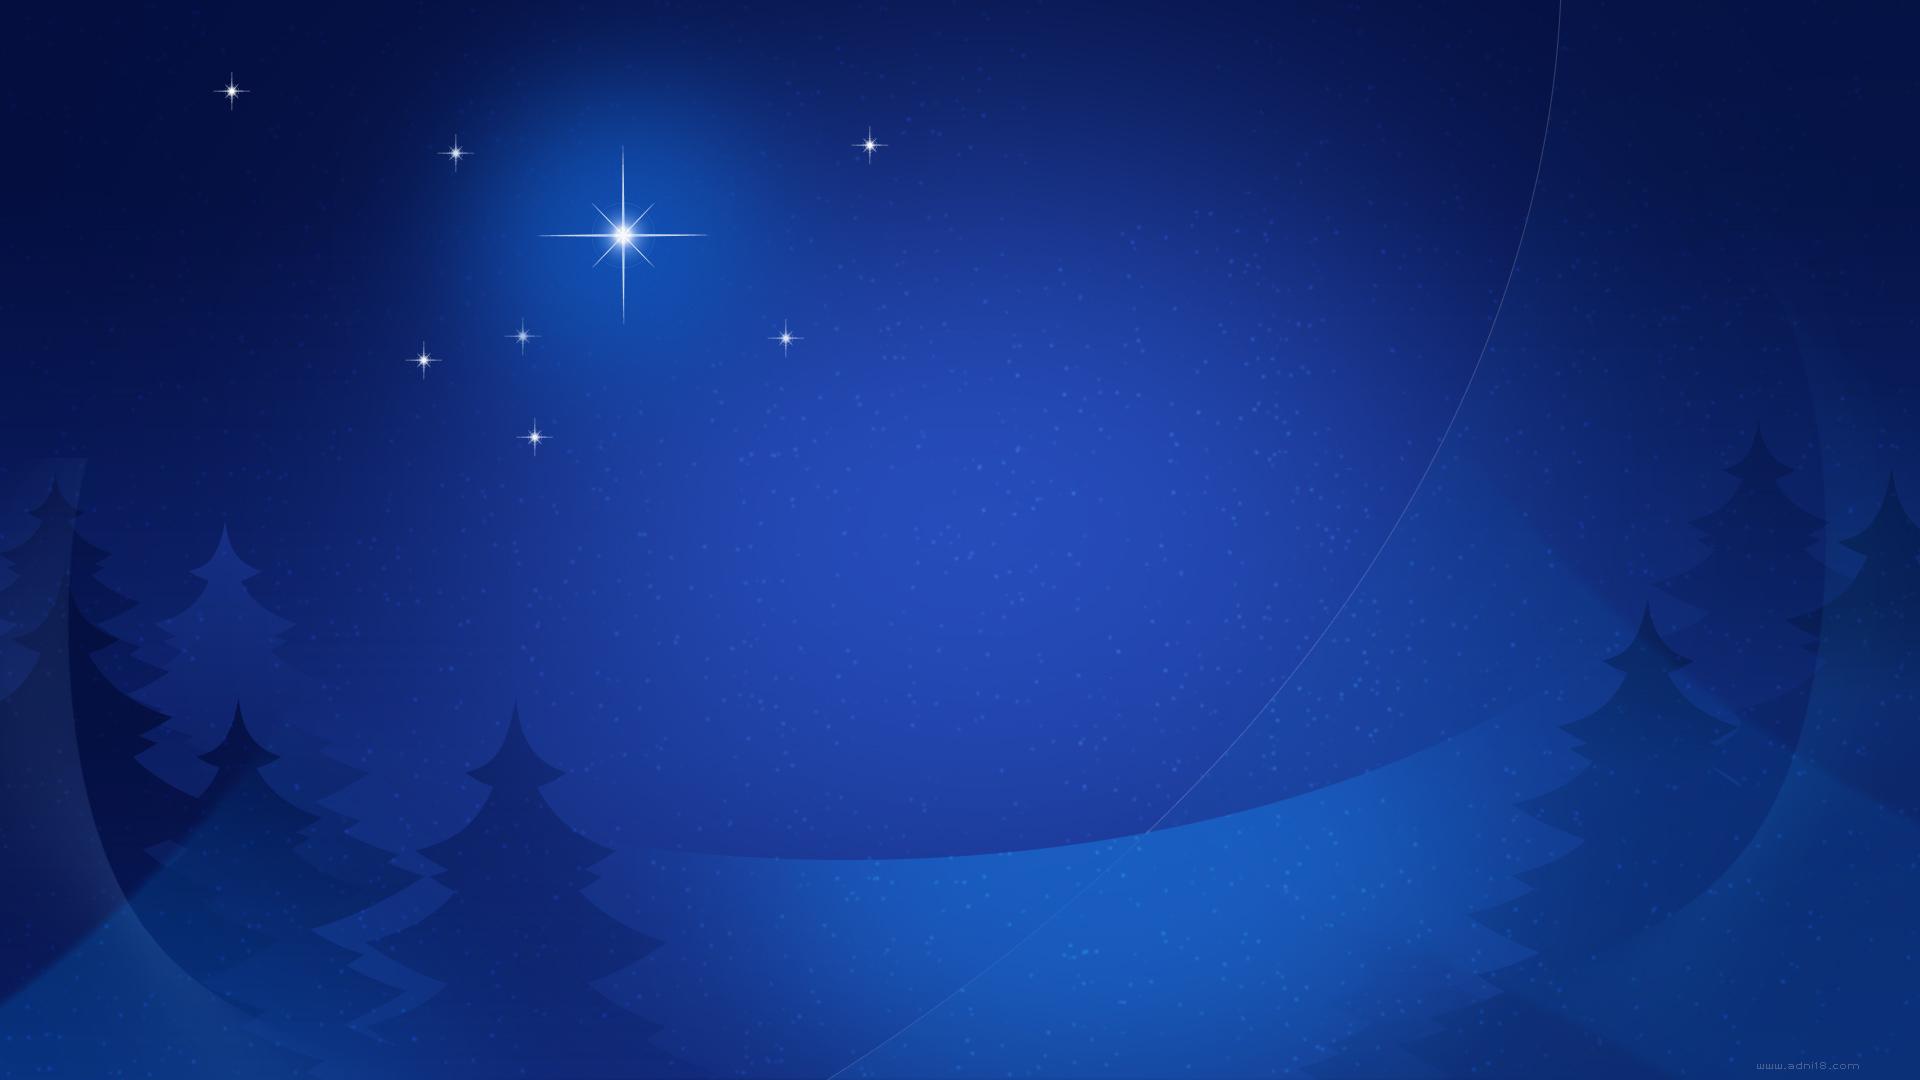 Wallpaper Trees Christmas Stars Night 1920x1080 Antistar